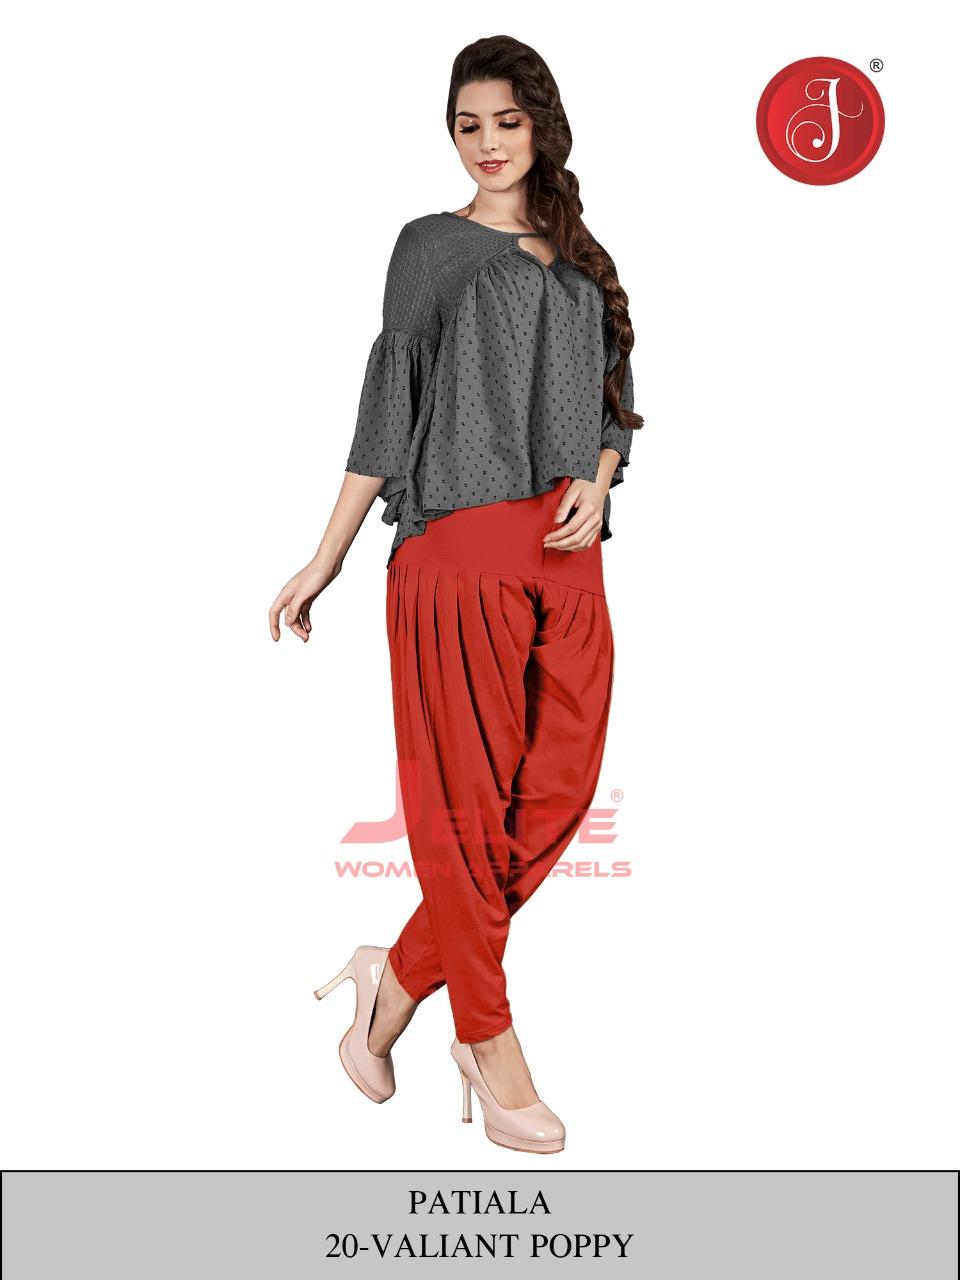 jelite patiala colorful casual bottom wear catalog at reasonable rate